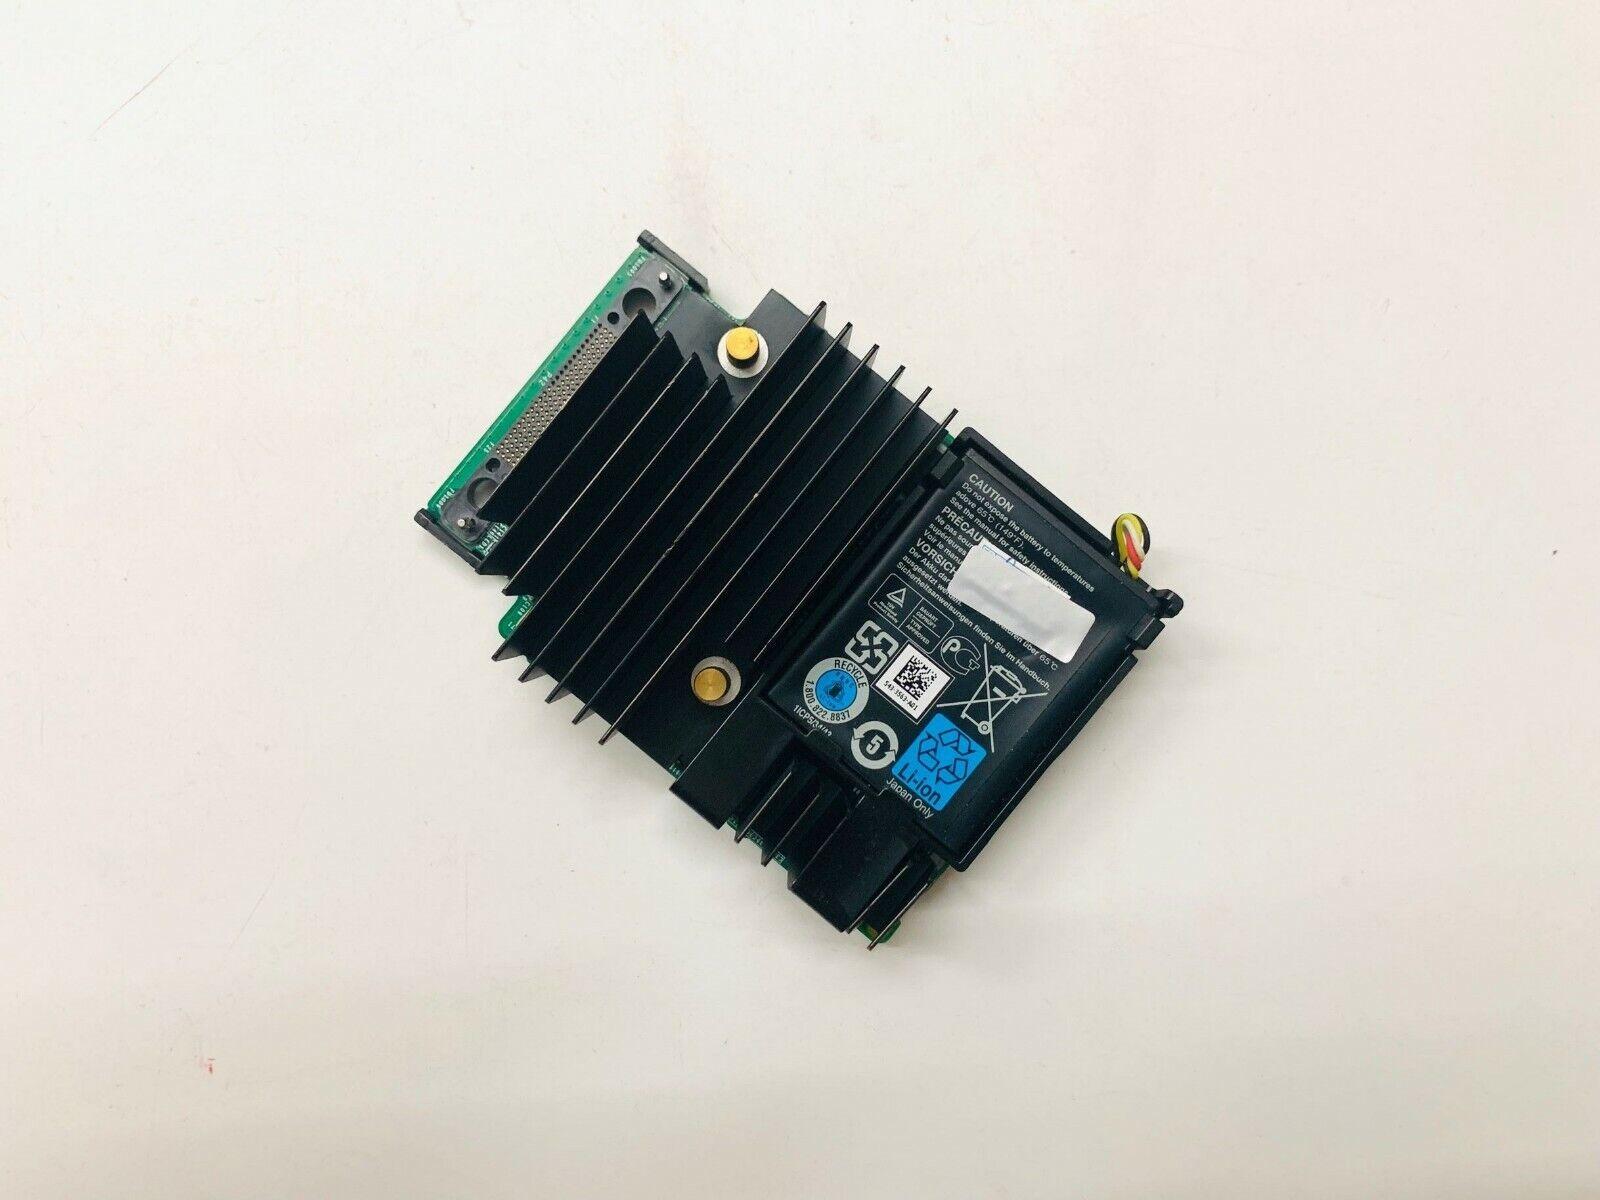 Server Components H730 MINI MONO RAID 12G 1GB NV DELL POWEREDGE ...